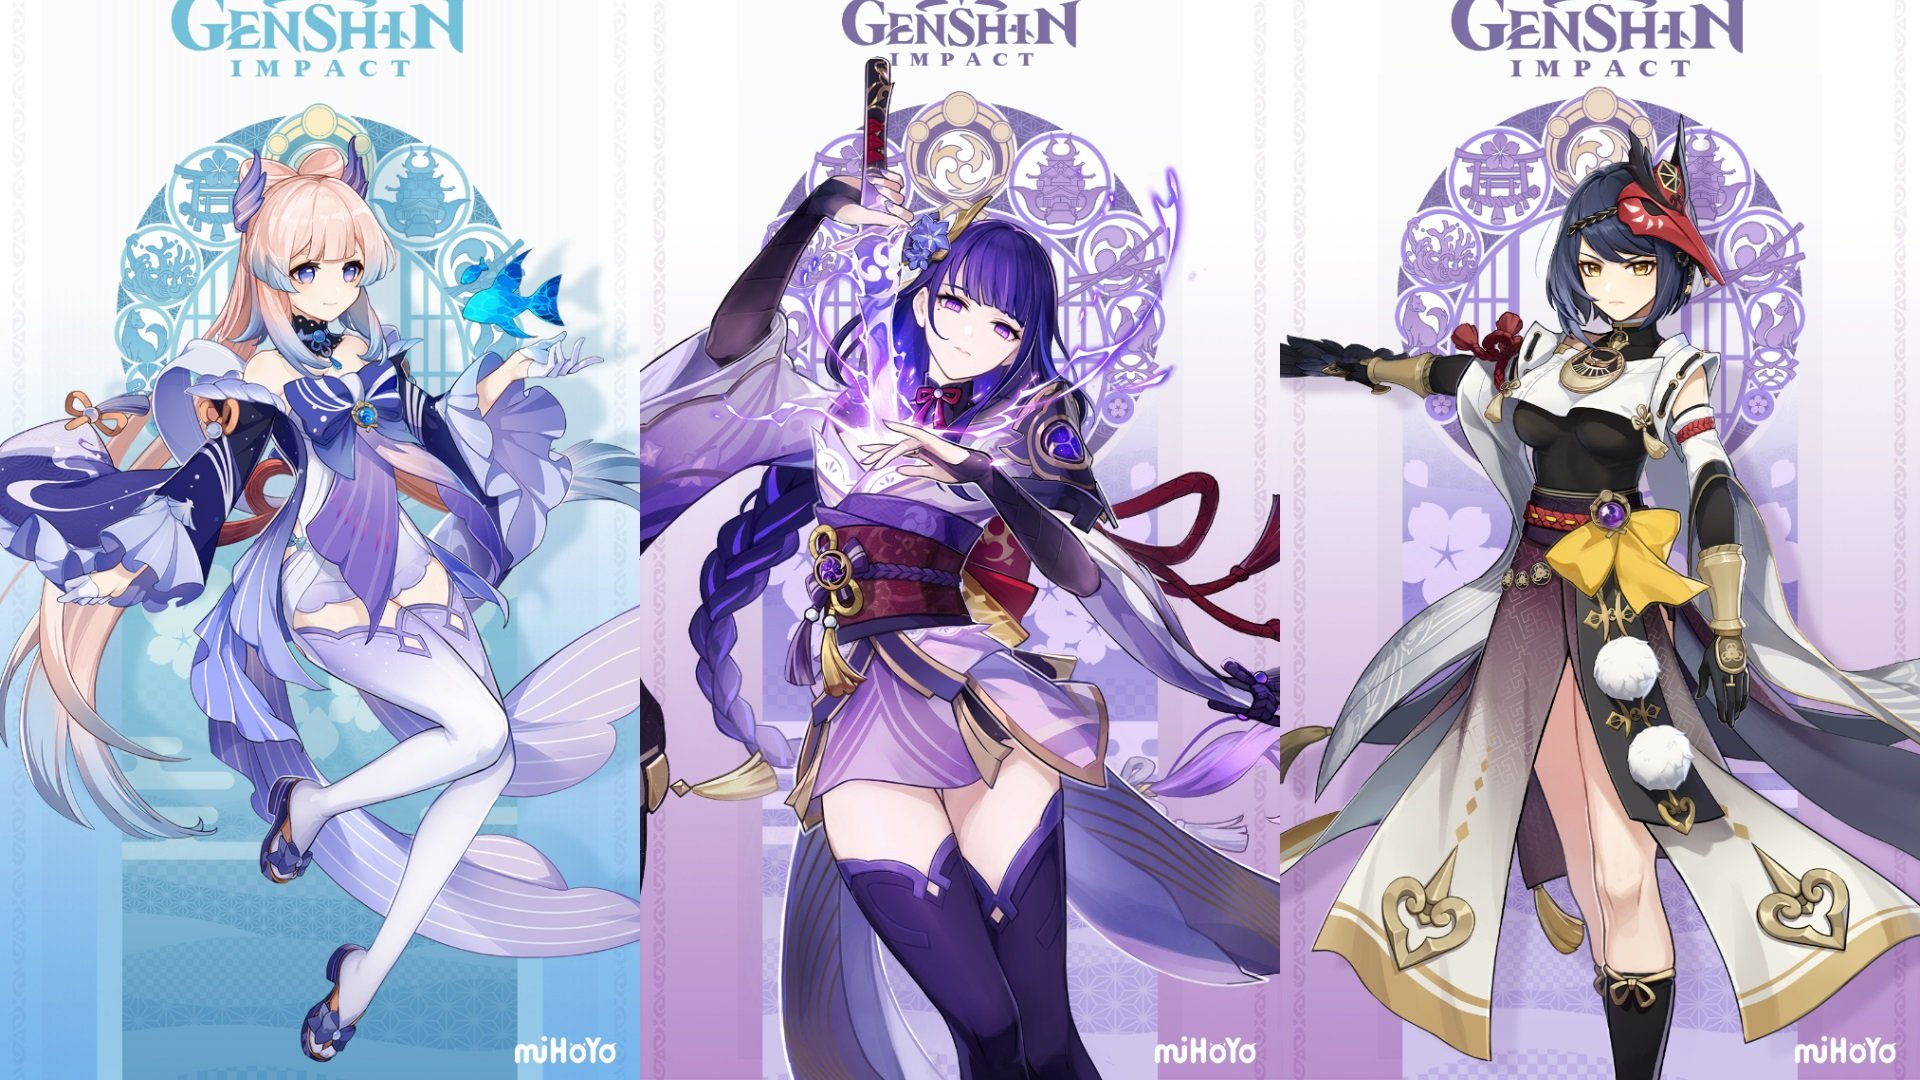 Calendrier de diffusion en direct de Genshin Impact 2.1 Twitch